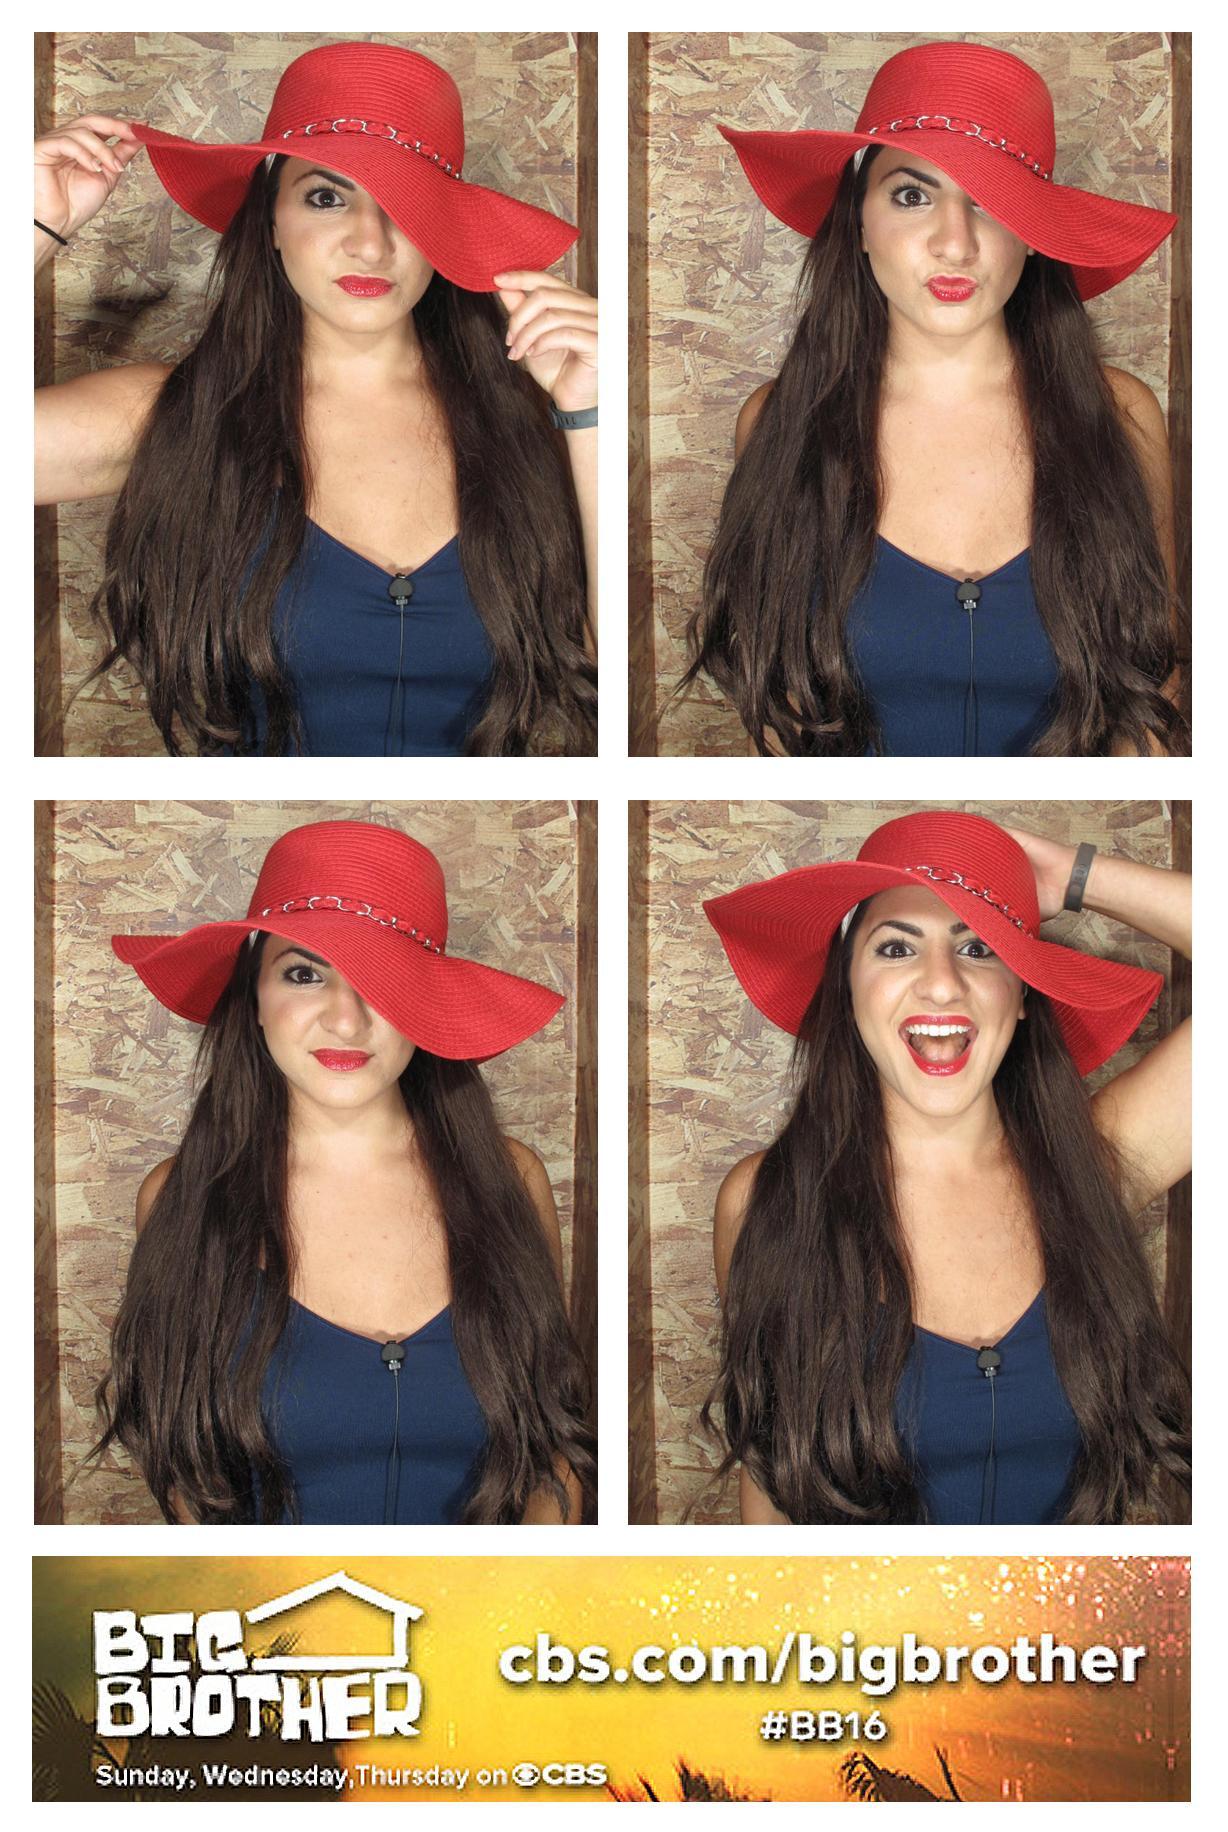 Victoria's red hat